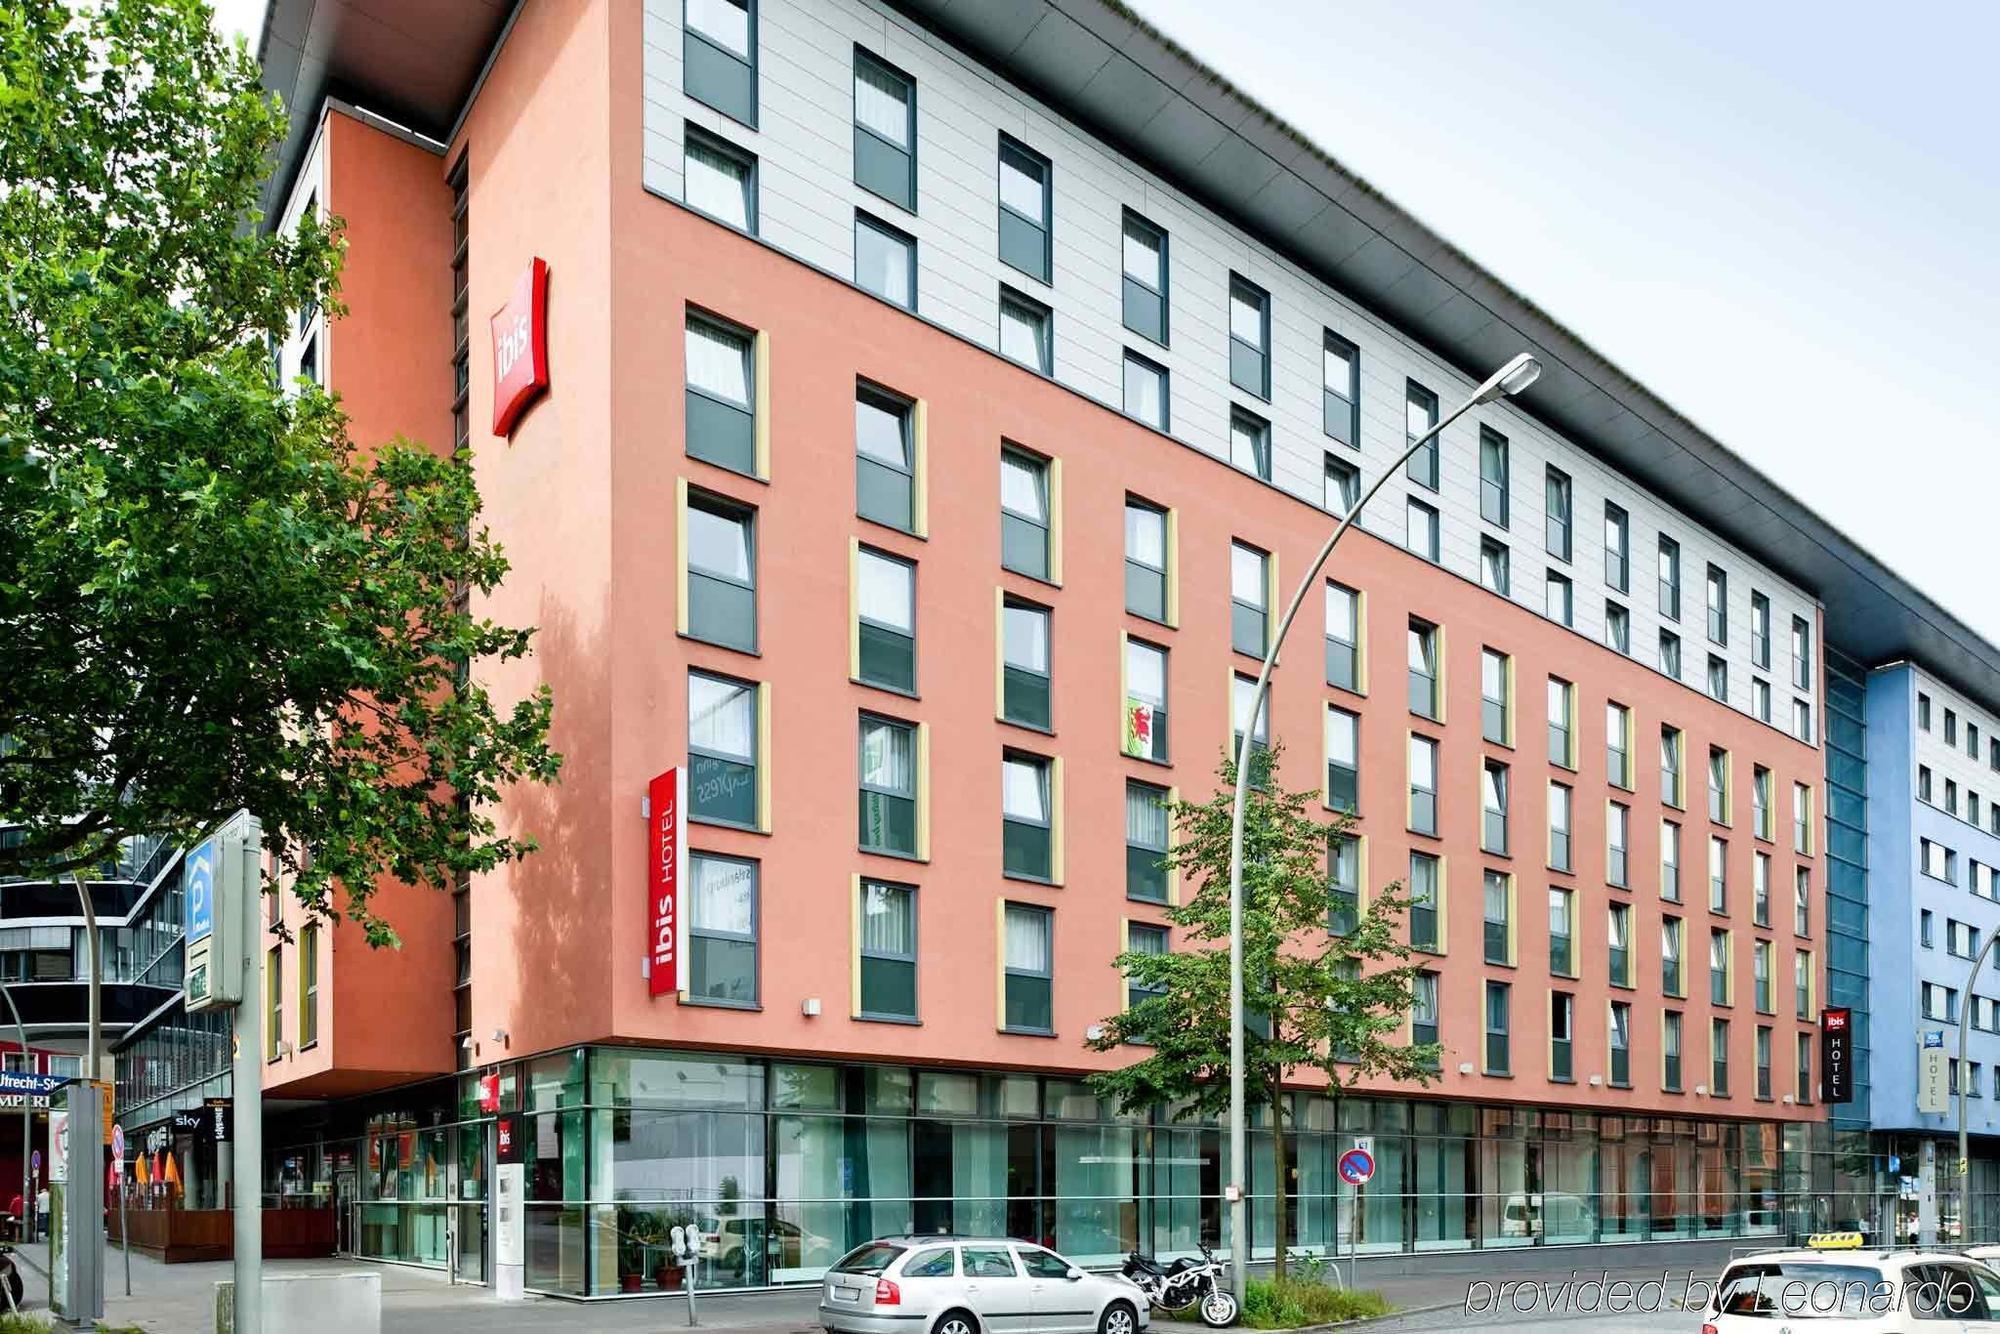 Ibis Hotel Hamburg City Hamburg Germany